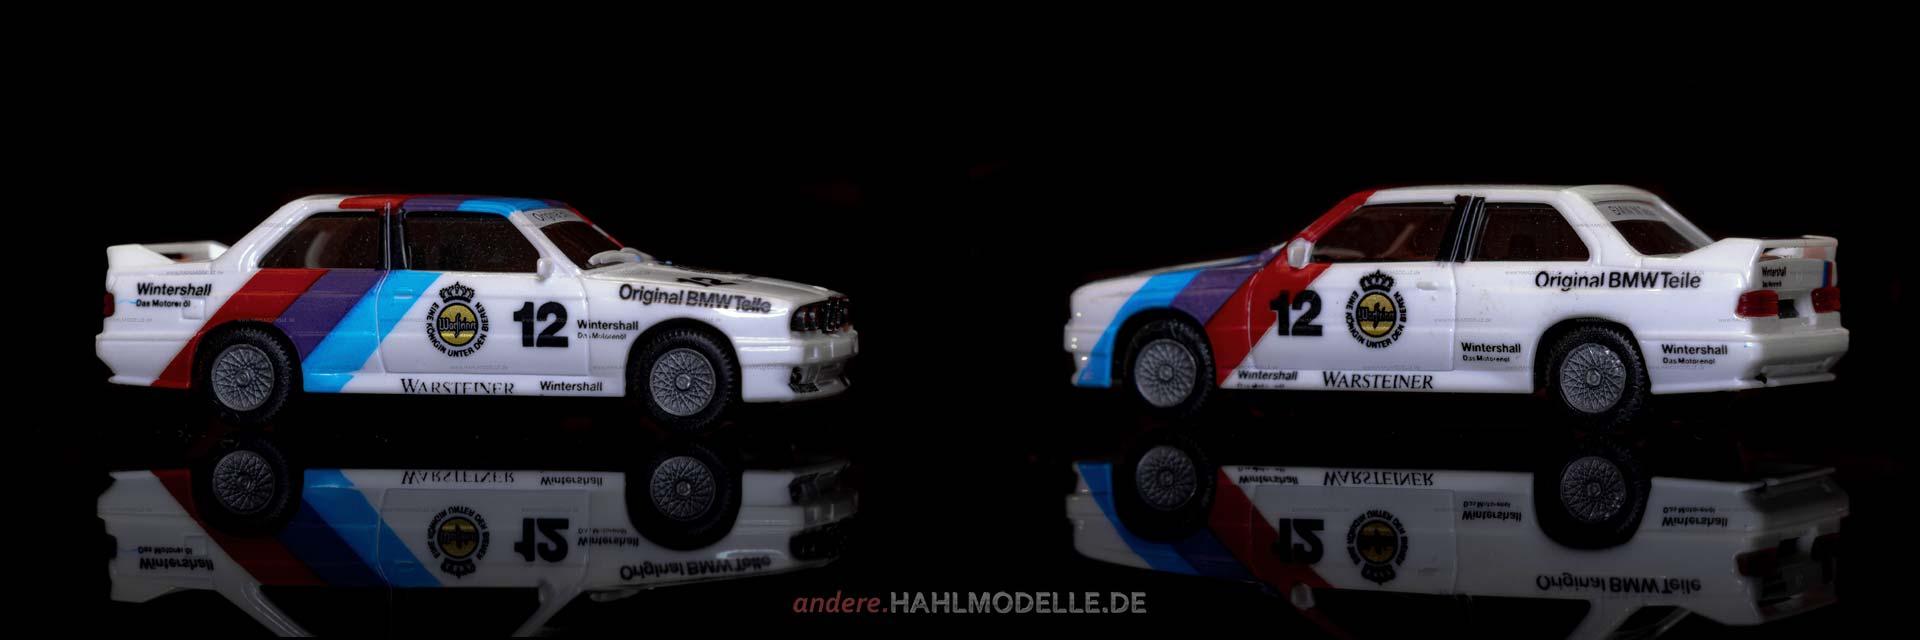 BMW M3 (E30) | Limousine | Motorsport | Herpa | 1:87 | www.andere.hahlmodelle.de